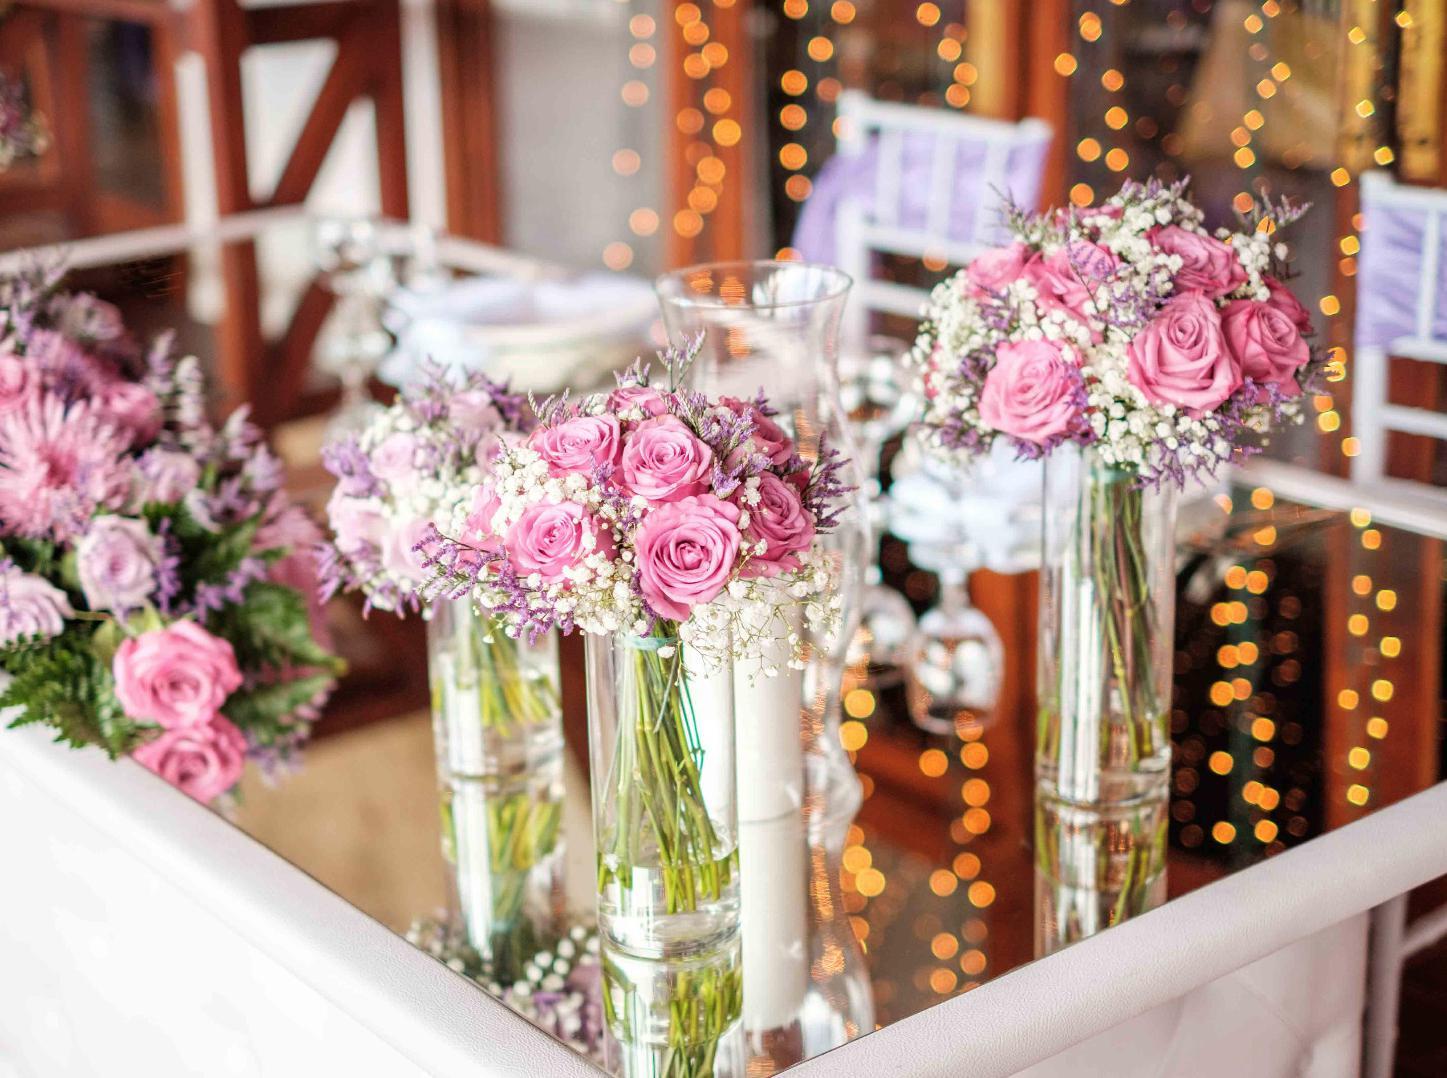 bodas-sin-clasificar-sin-tema-cuba-35831.jpg